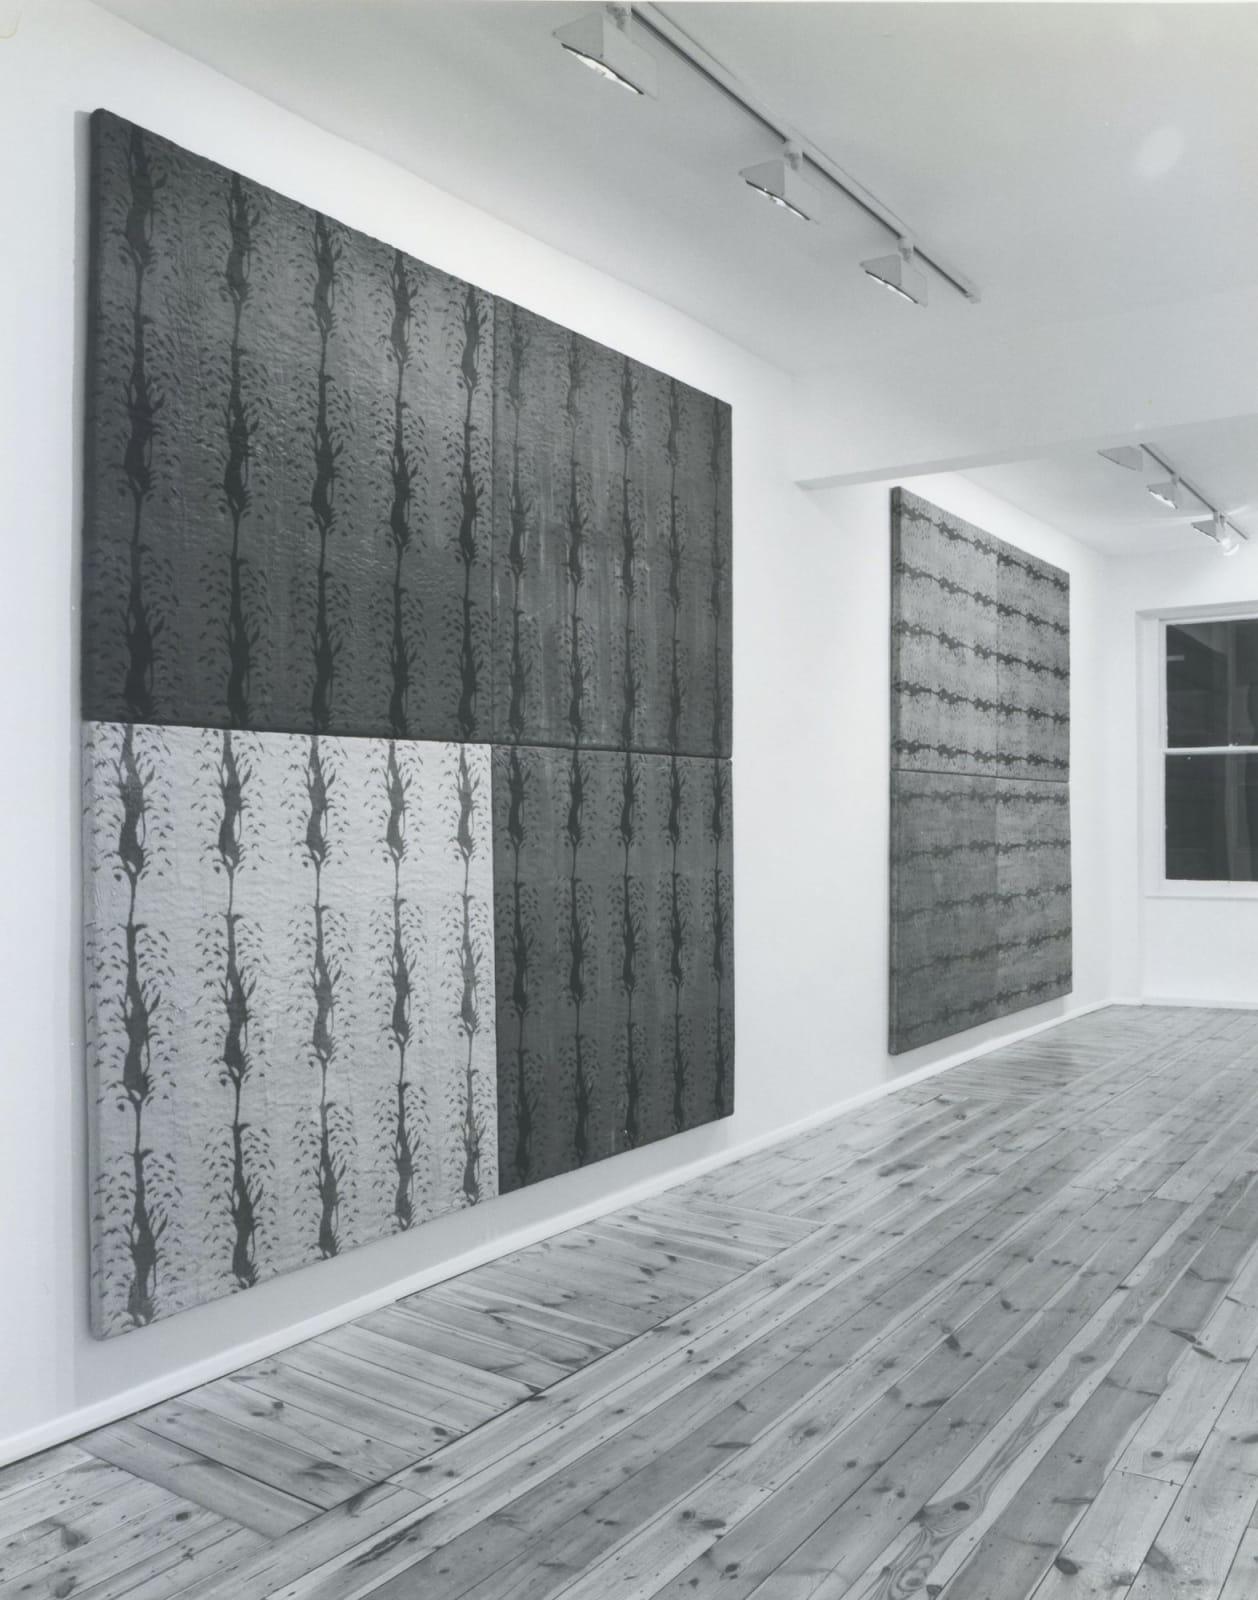 Eric Bainbridge: Paintings, installation view, November 1987